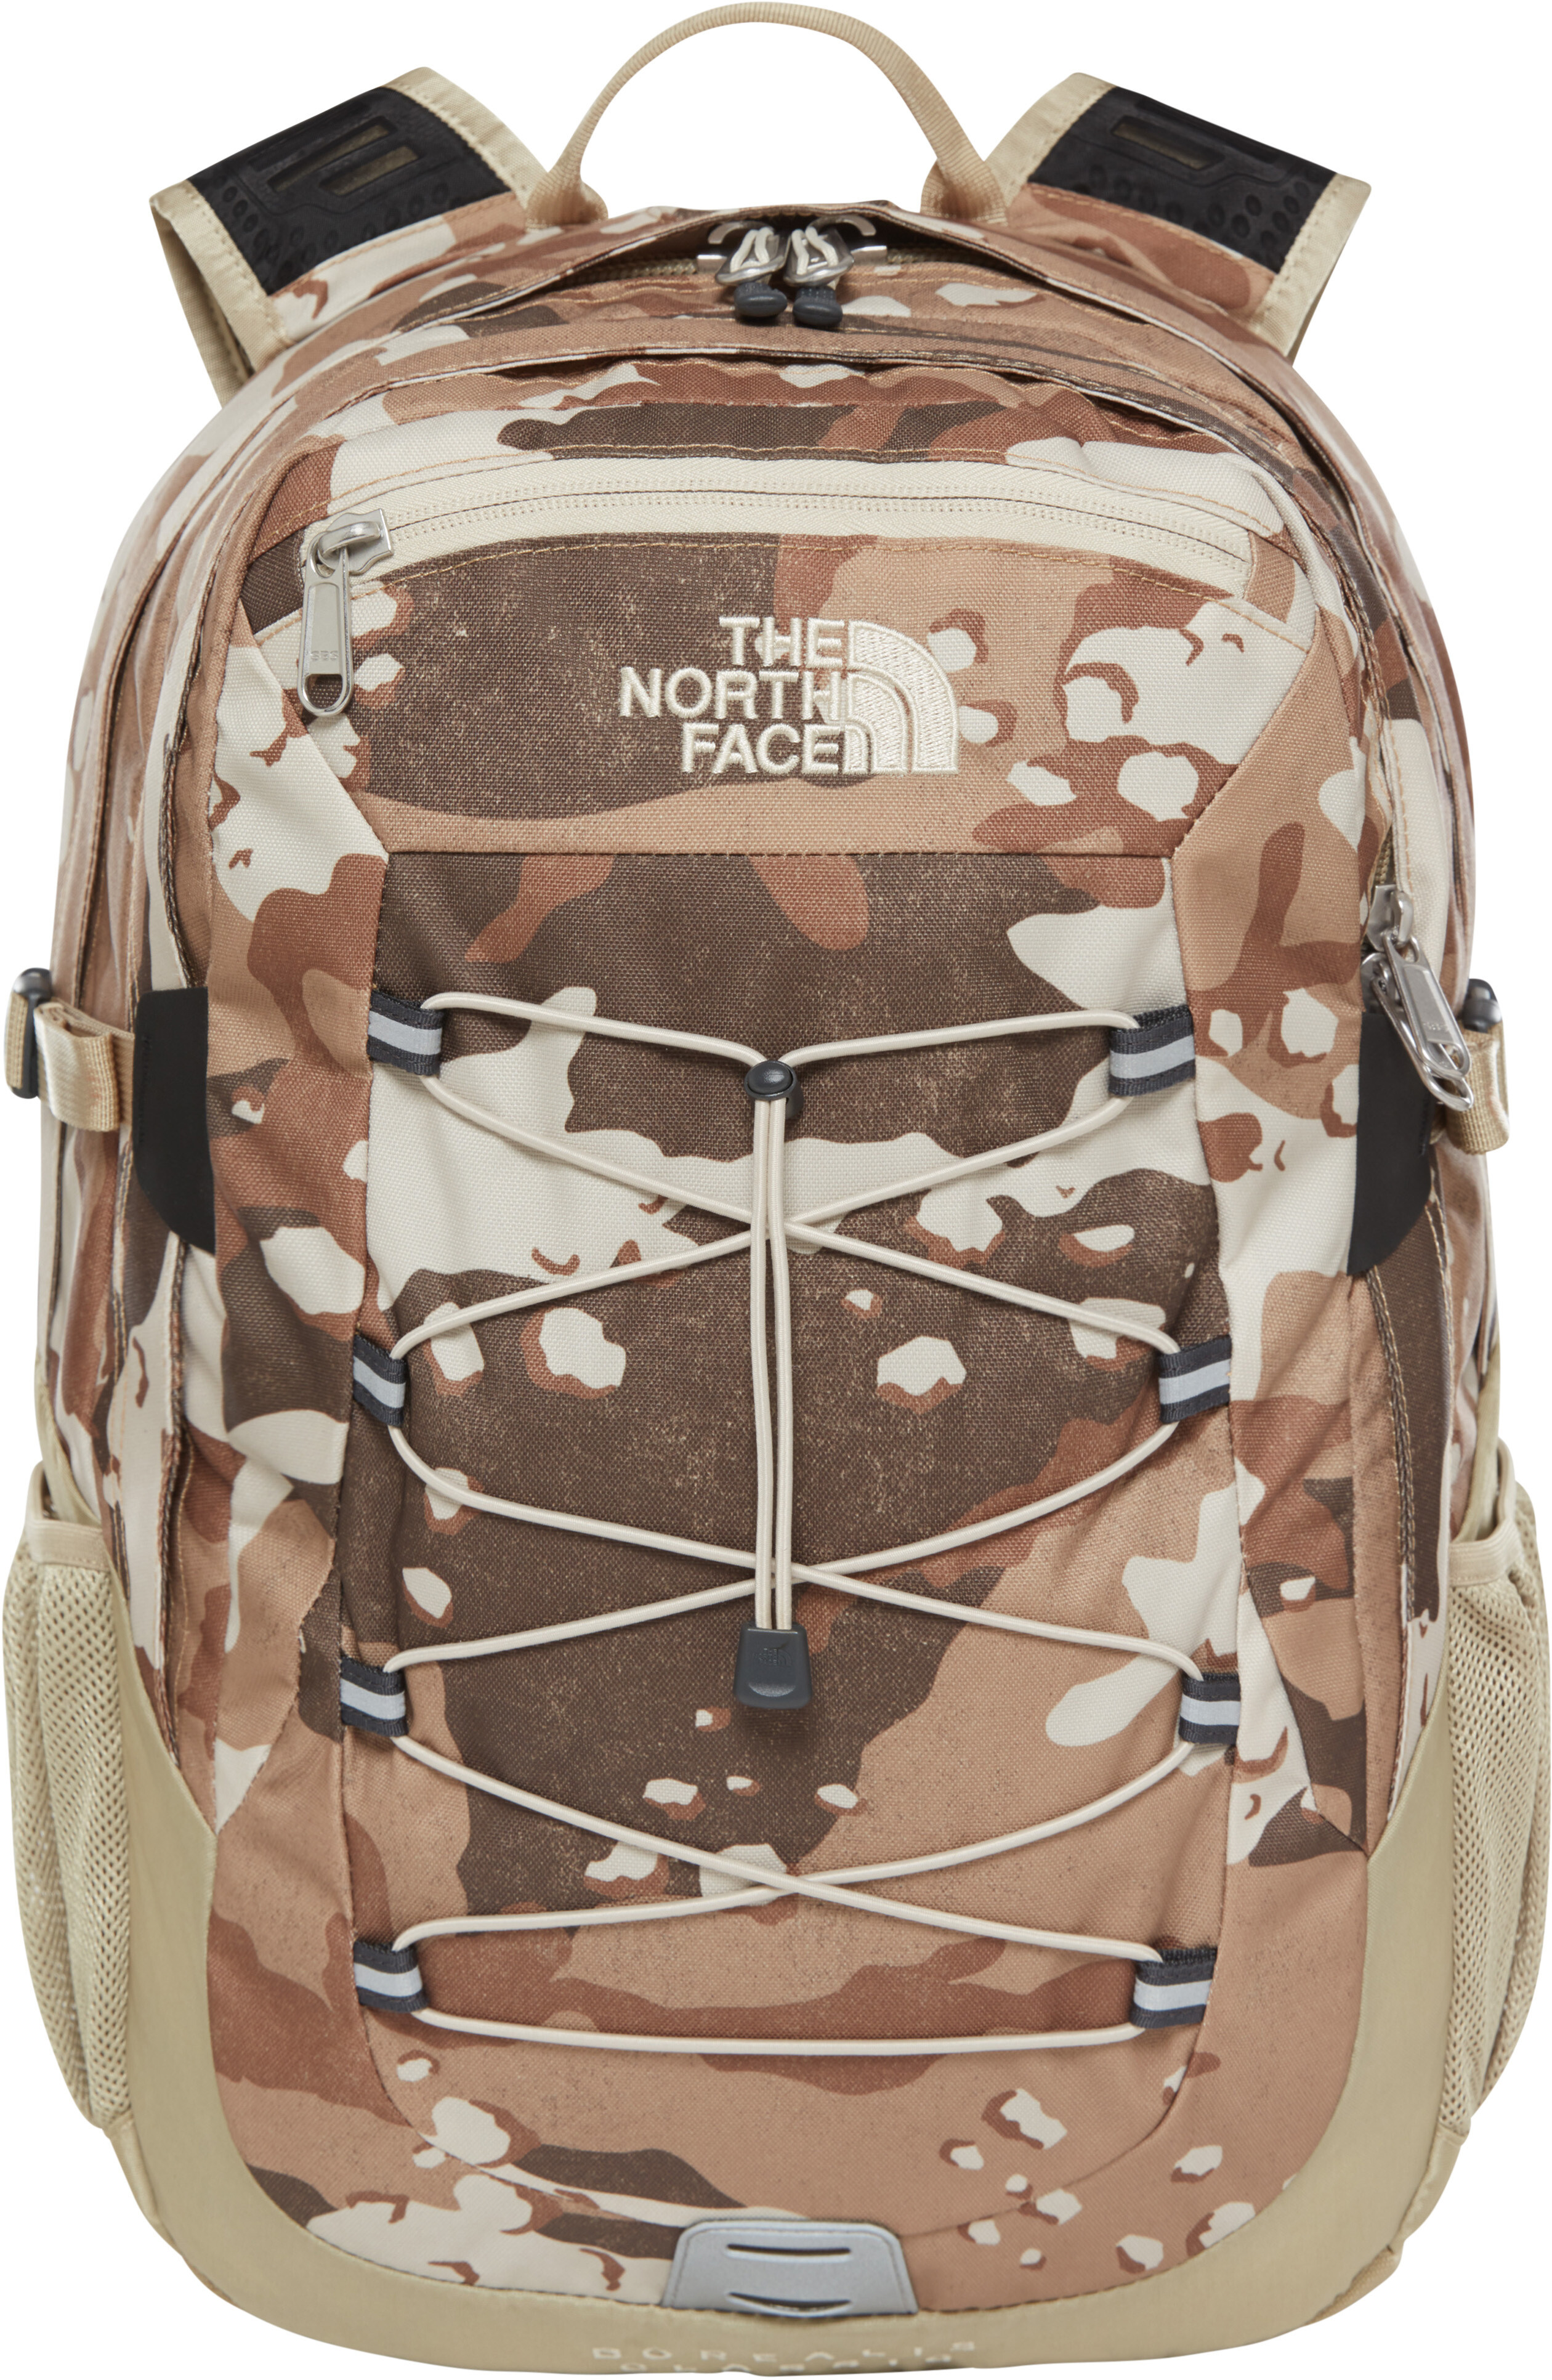 cca576211f The North Face Borealis Classic Backpack 29l, moab khaki woodchip camo  desert print/twill